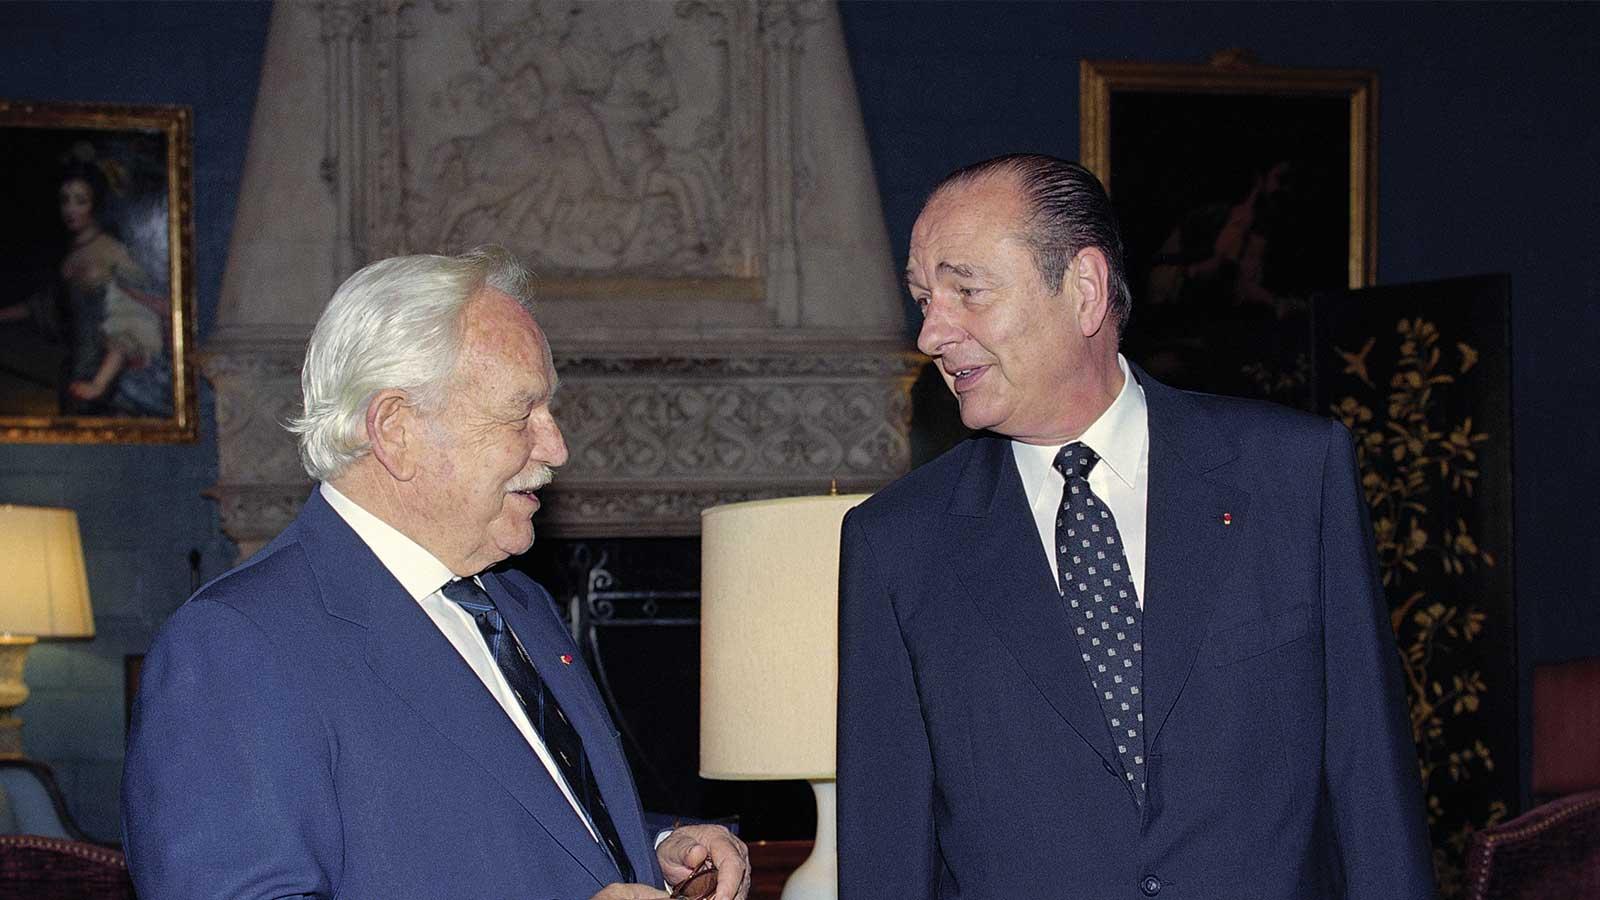 Jacques-Chirac-Rainier-III-rencontre-monaco